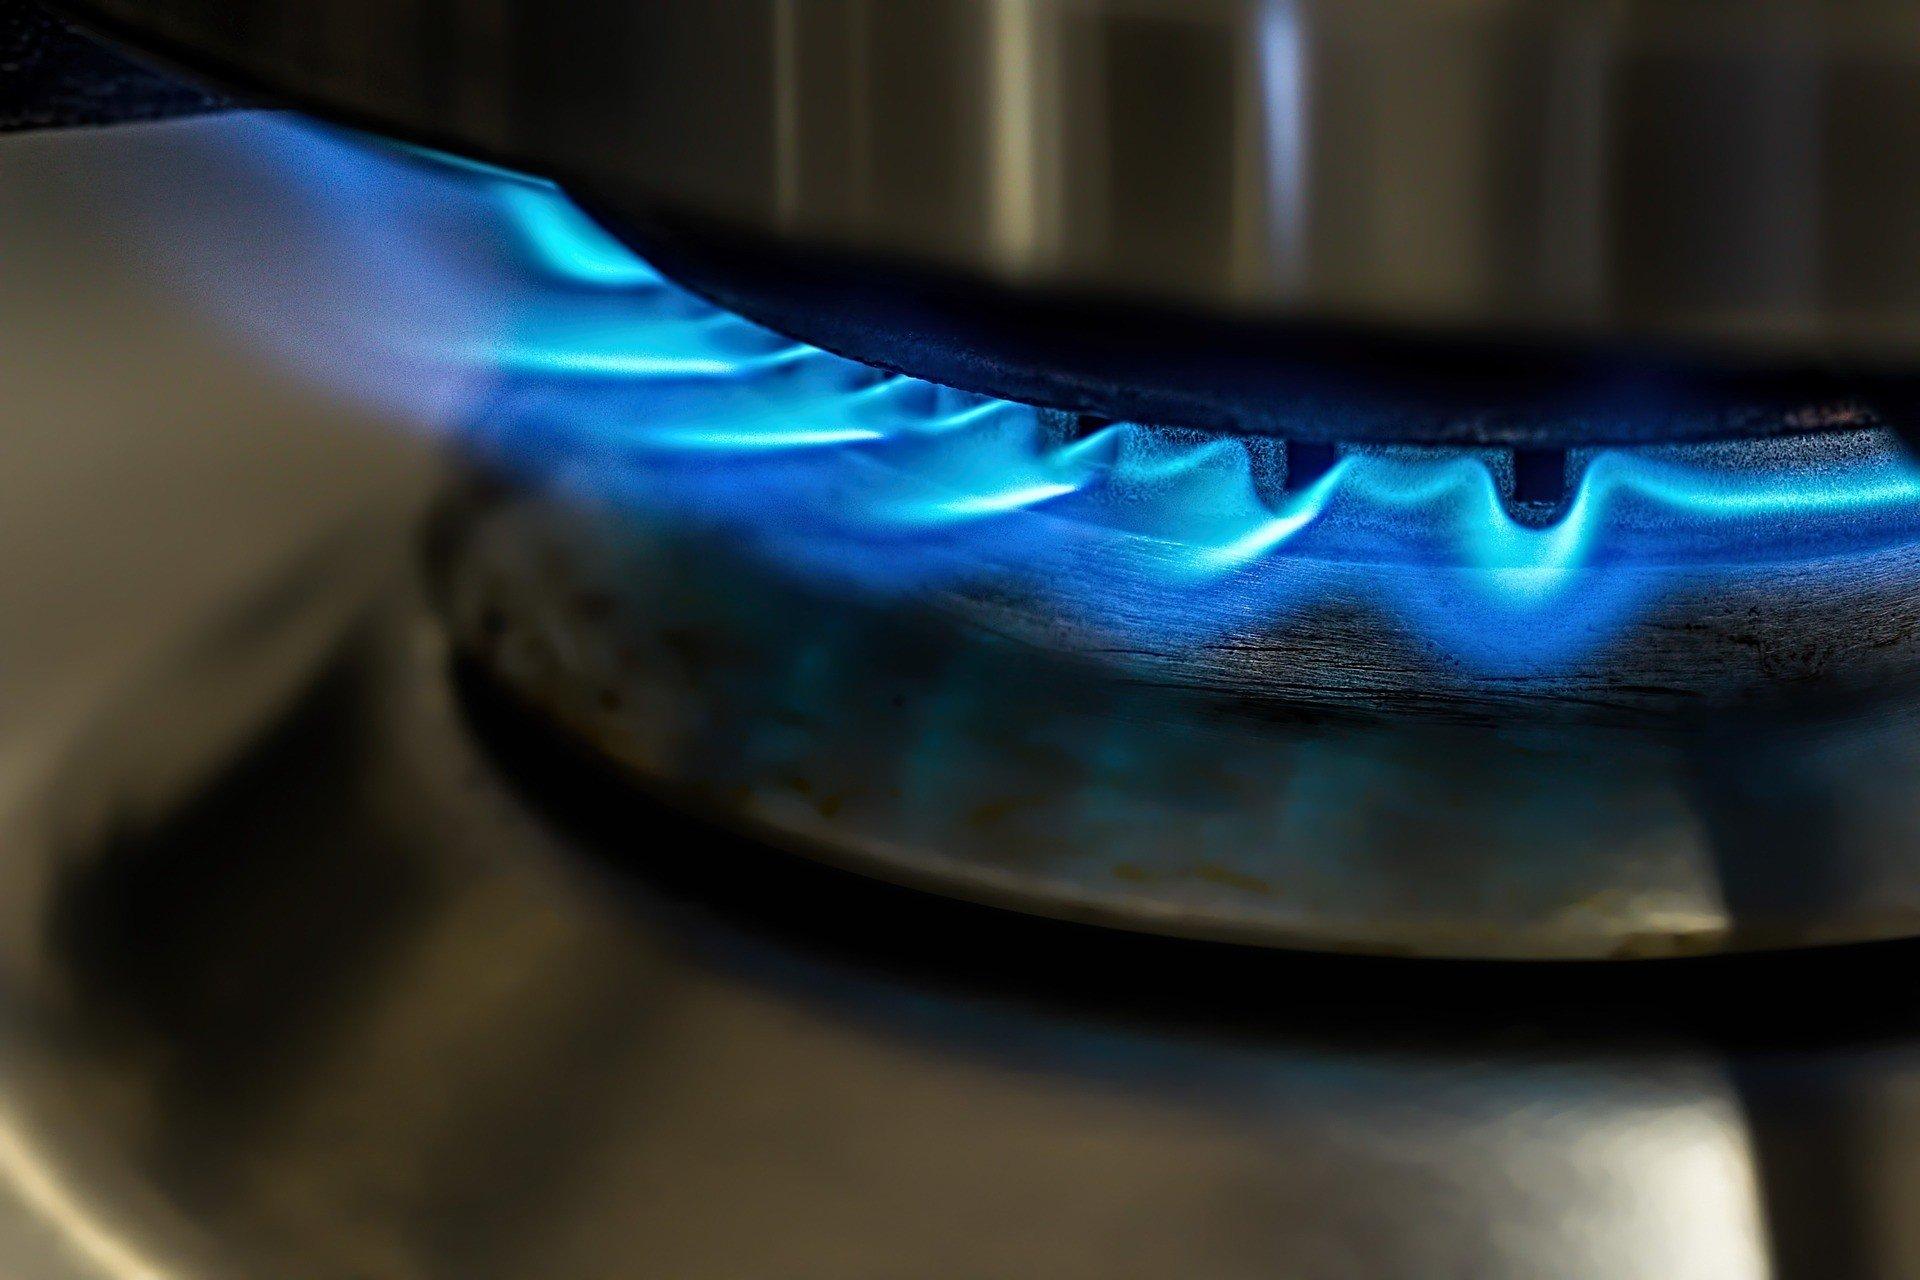 Снижение цен на газ и платежки - мнение эксперта